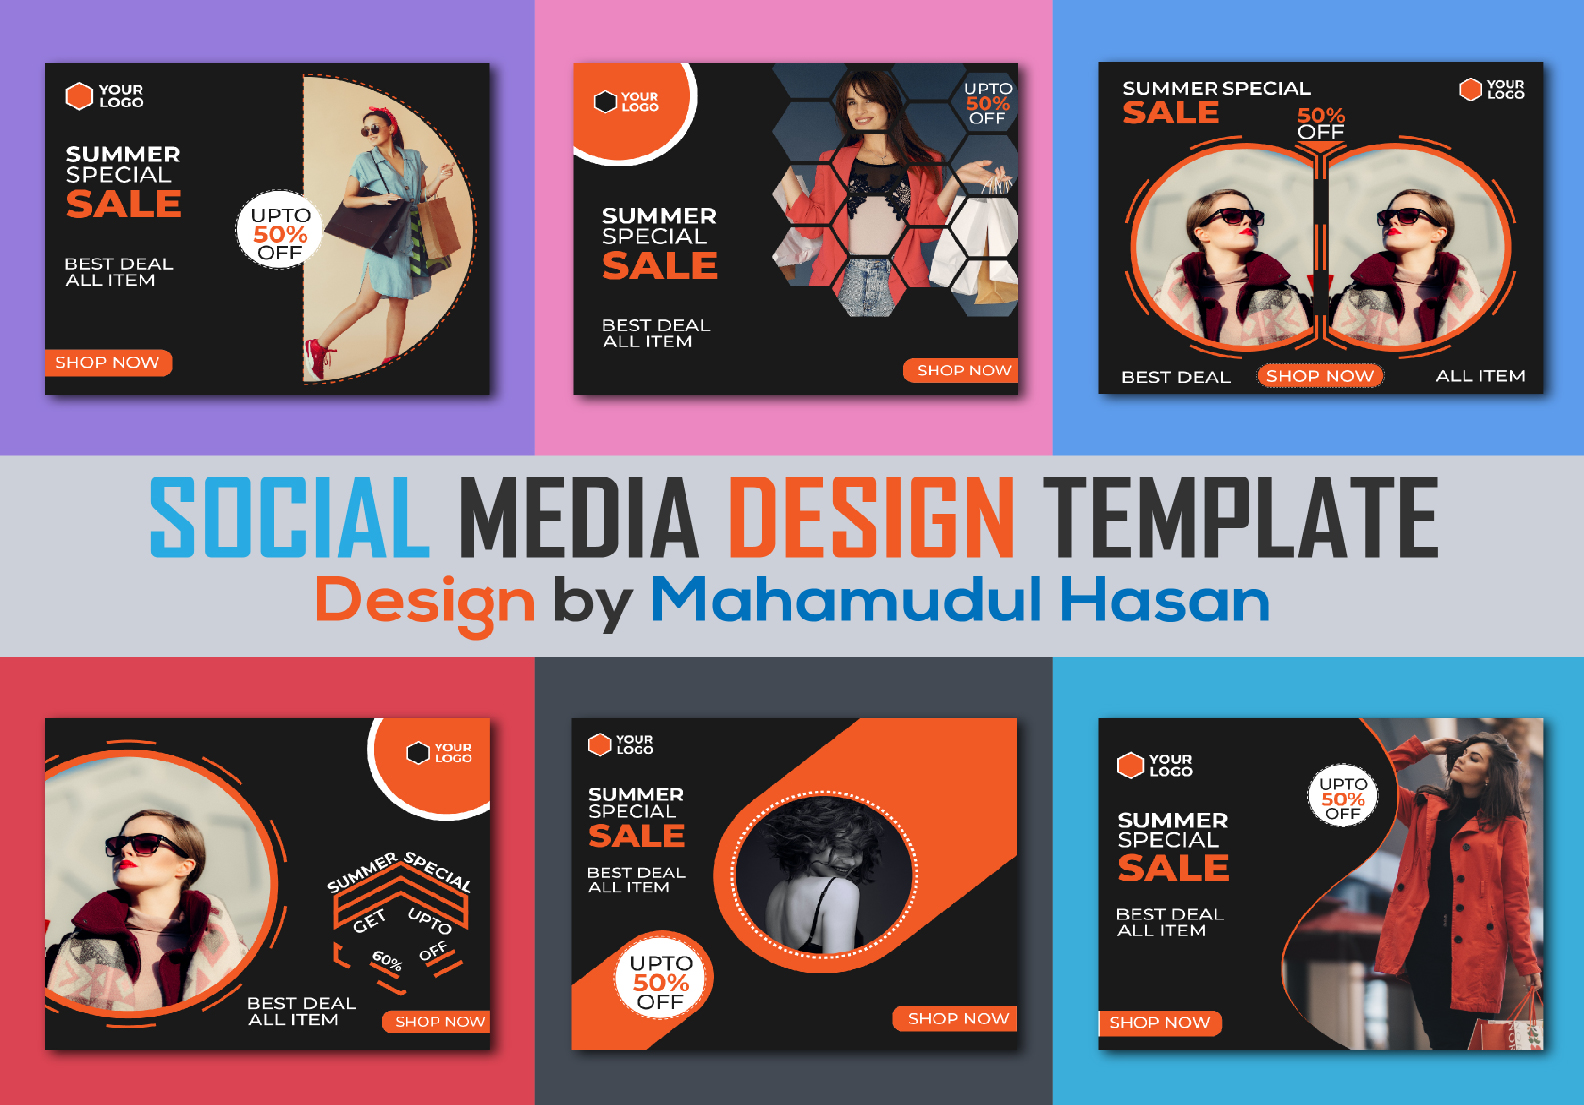 I will create trendy social media design template